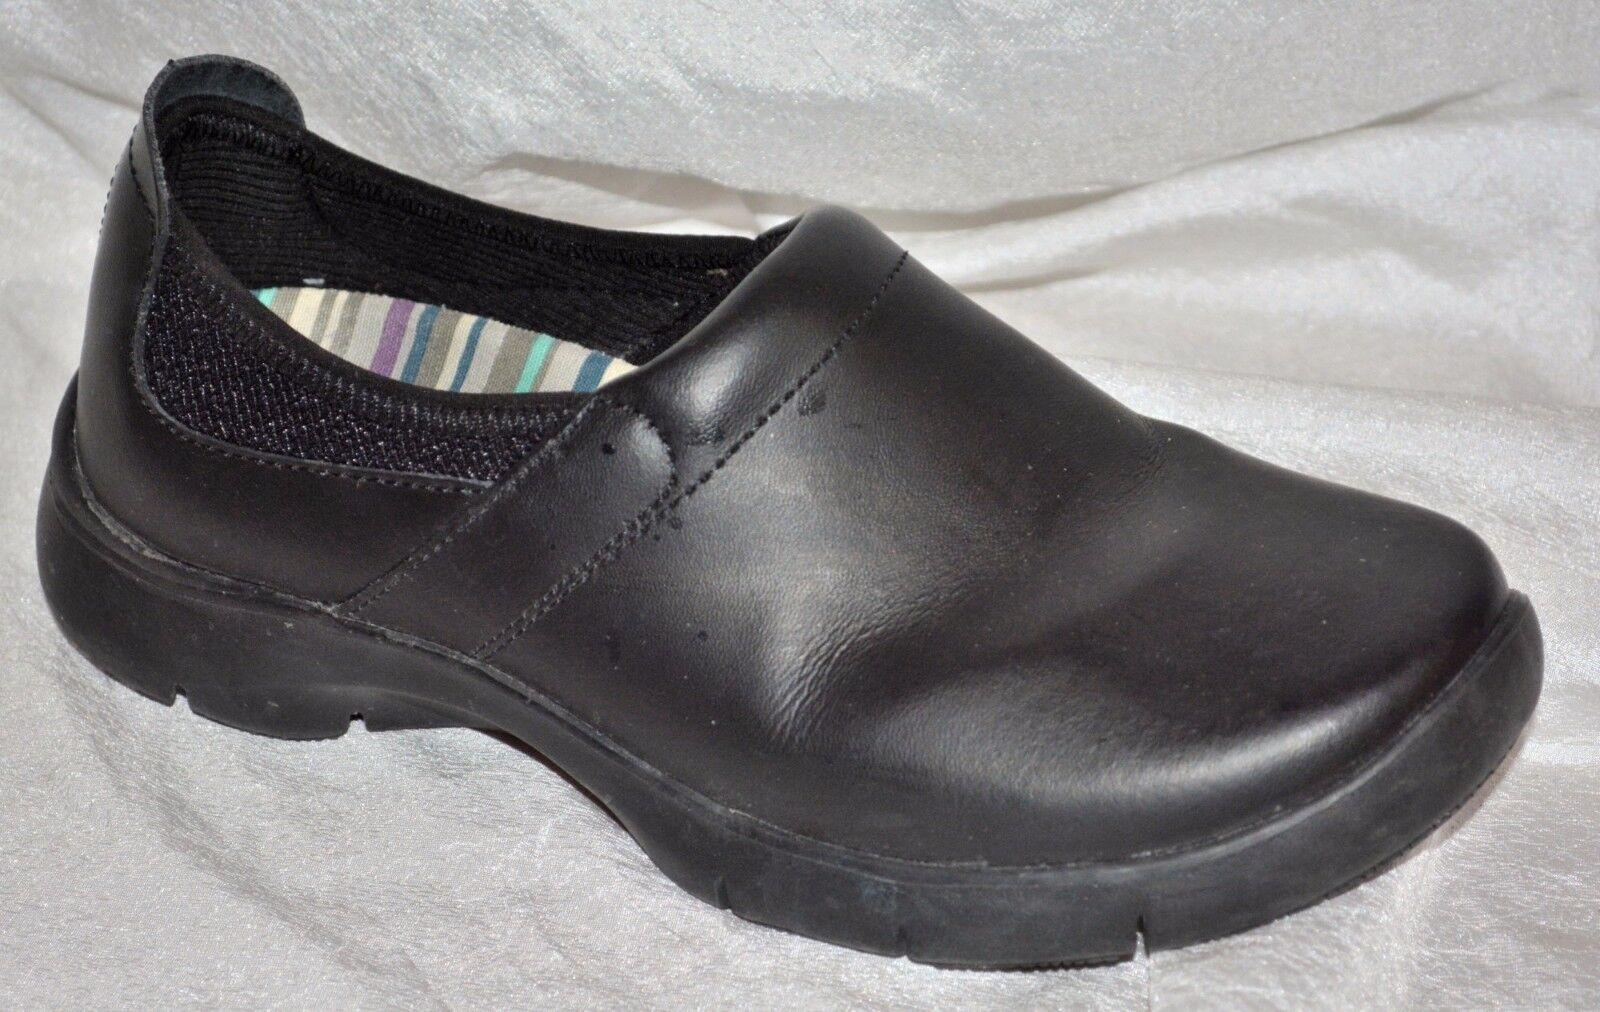 Dansko Enya Slip On Comfort Clog nero Leather Dimensione EU  38 US 7.5 -7 scarpe intasa  rivenditore di fitness